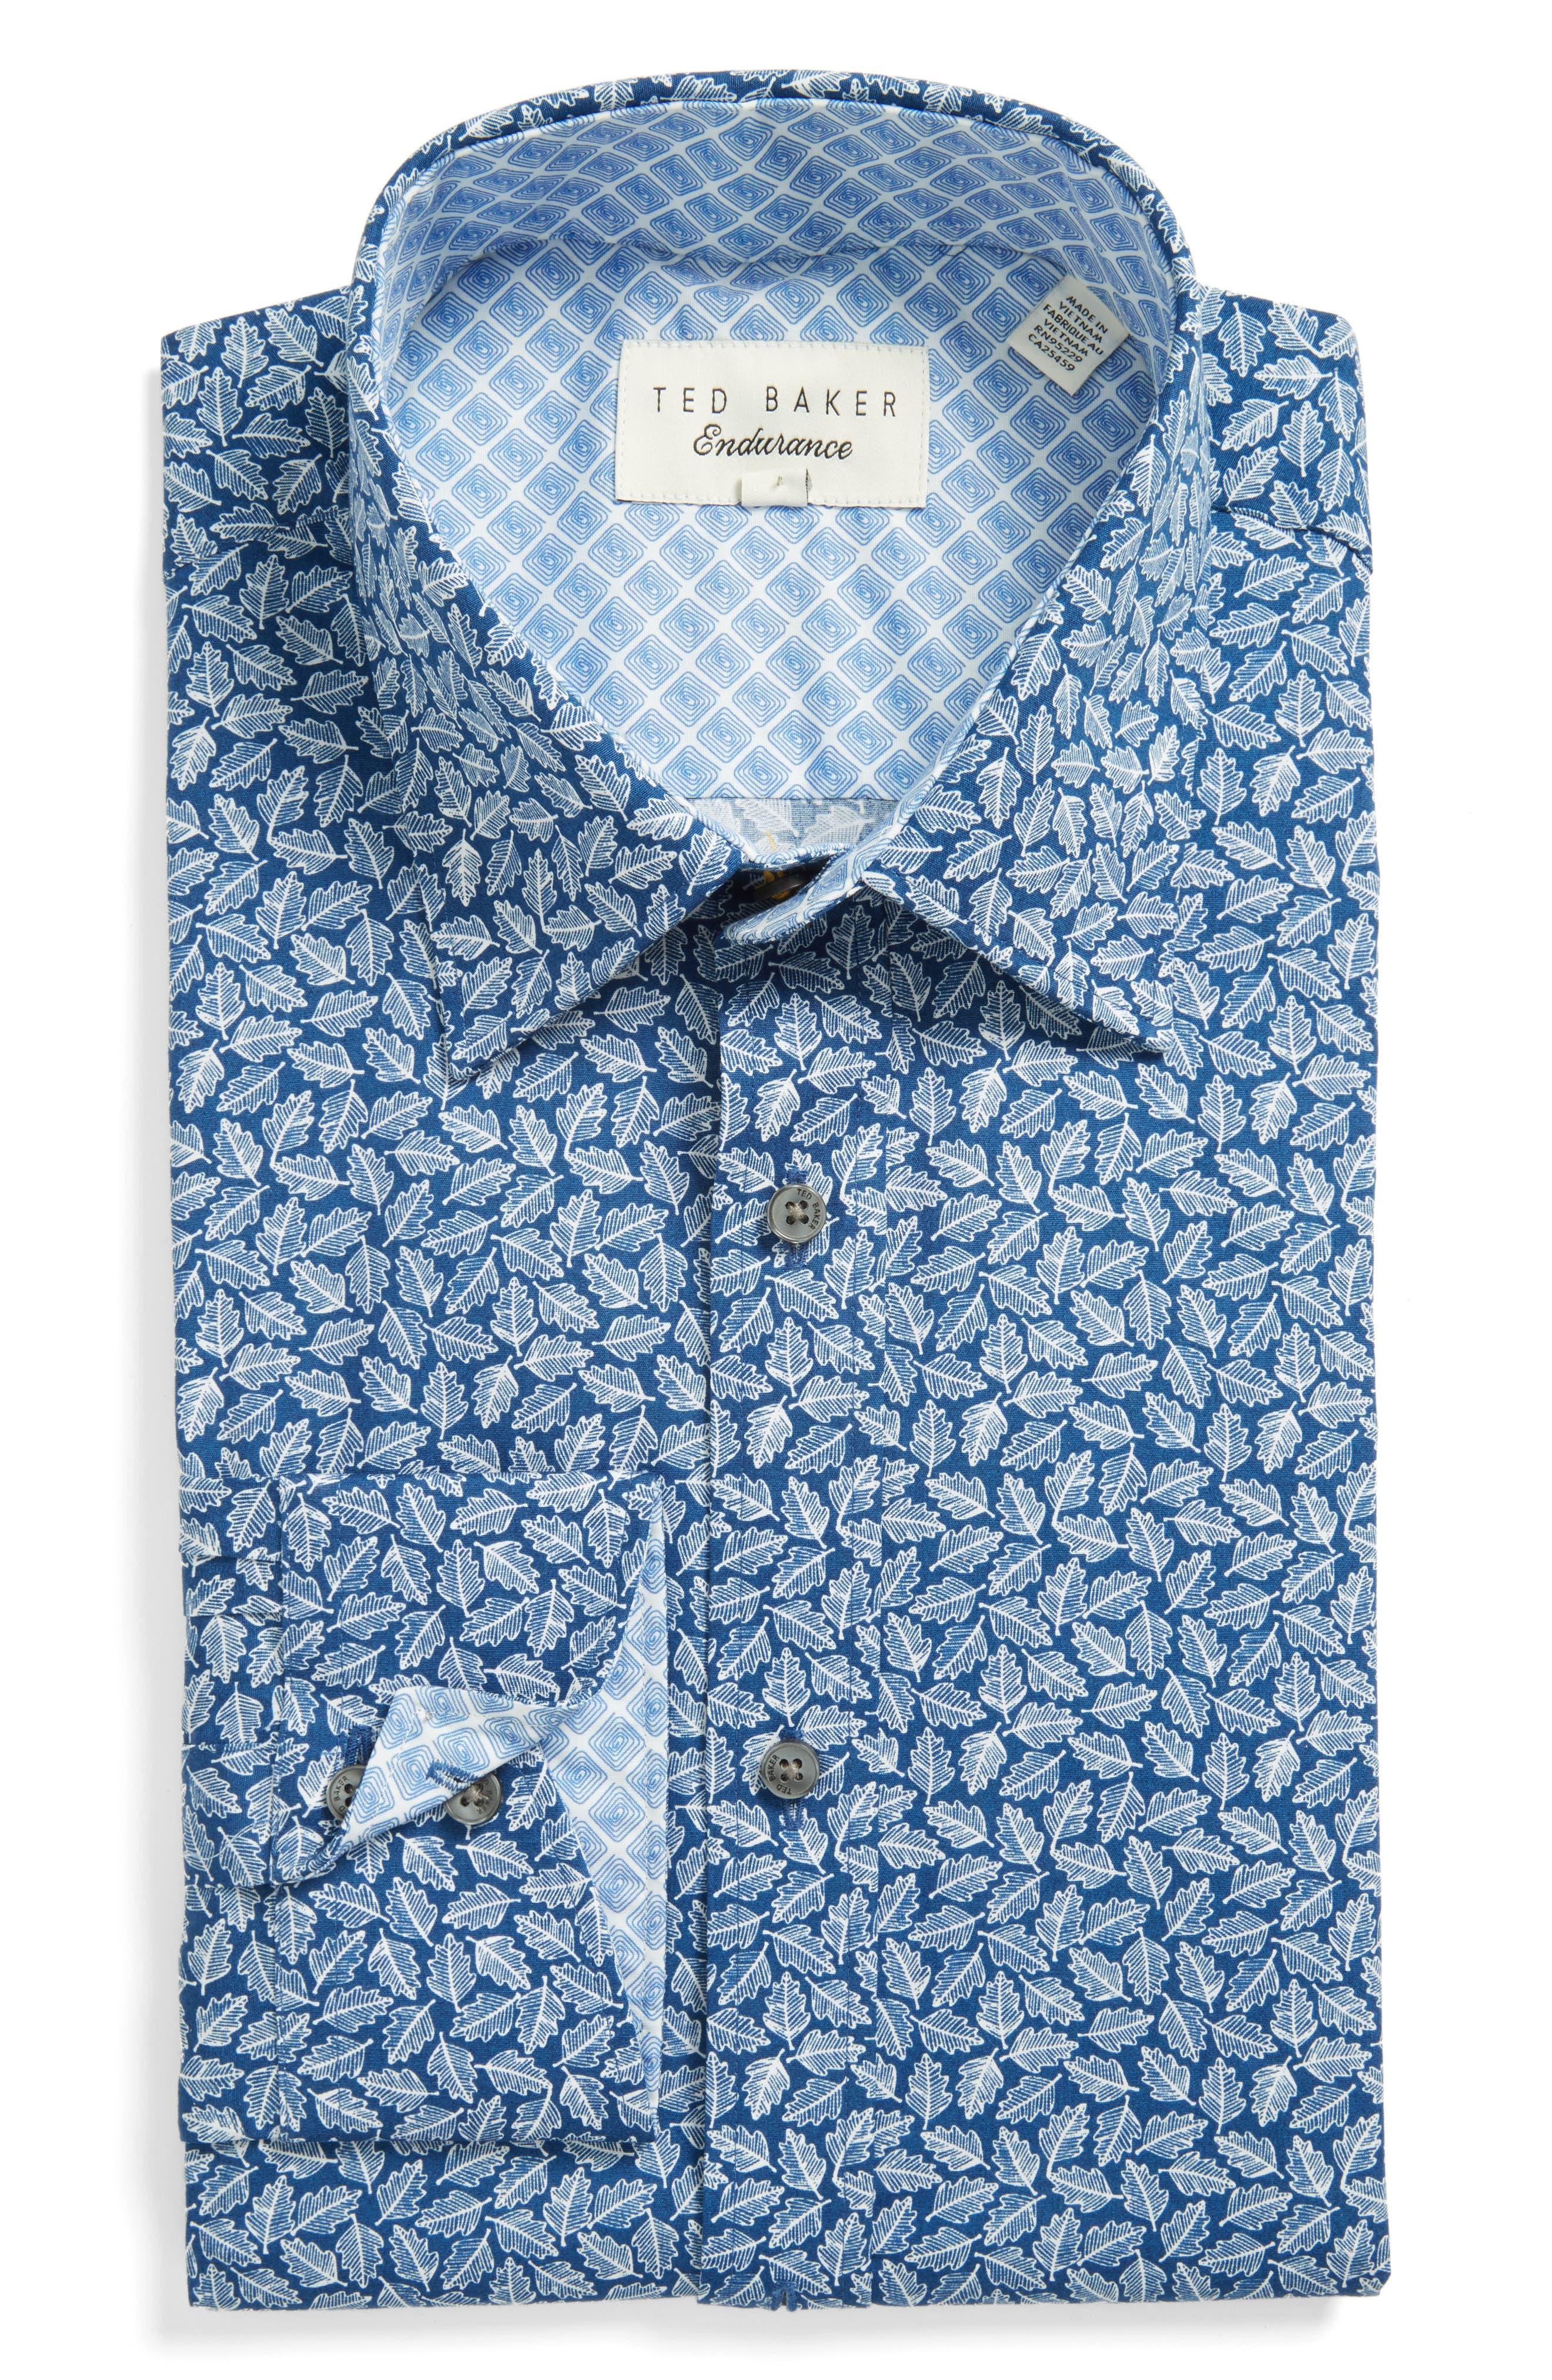 Alternate Image 1 Selected - Ted Baker London Endurance Trim Fit Print Dress Shirt